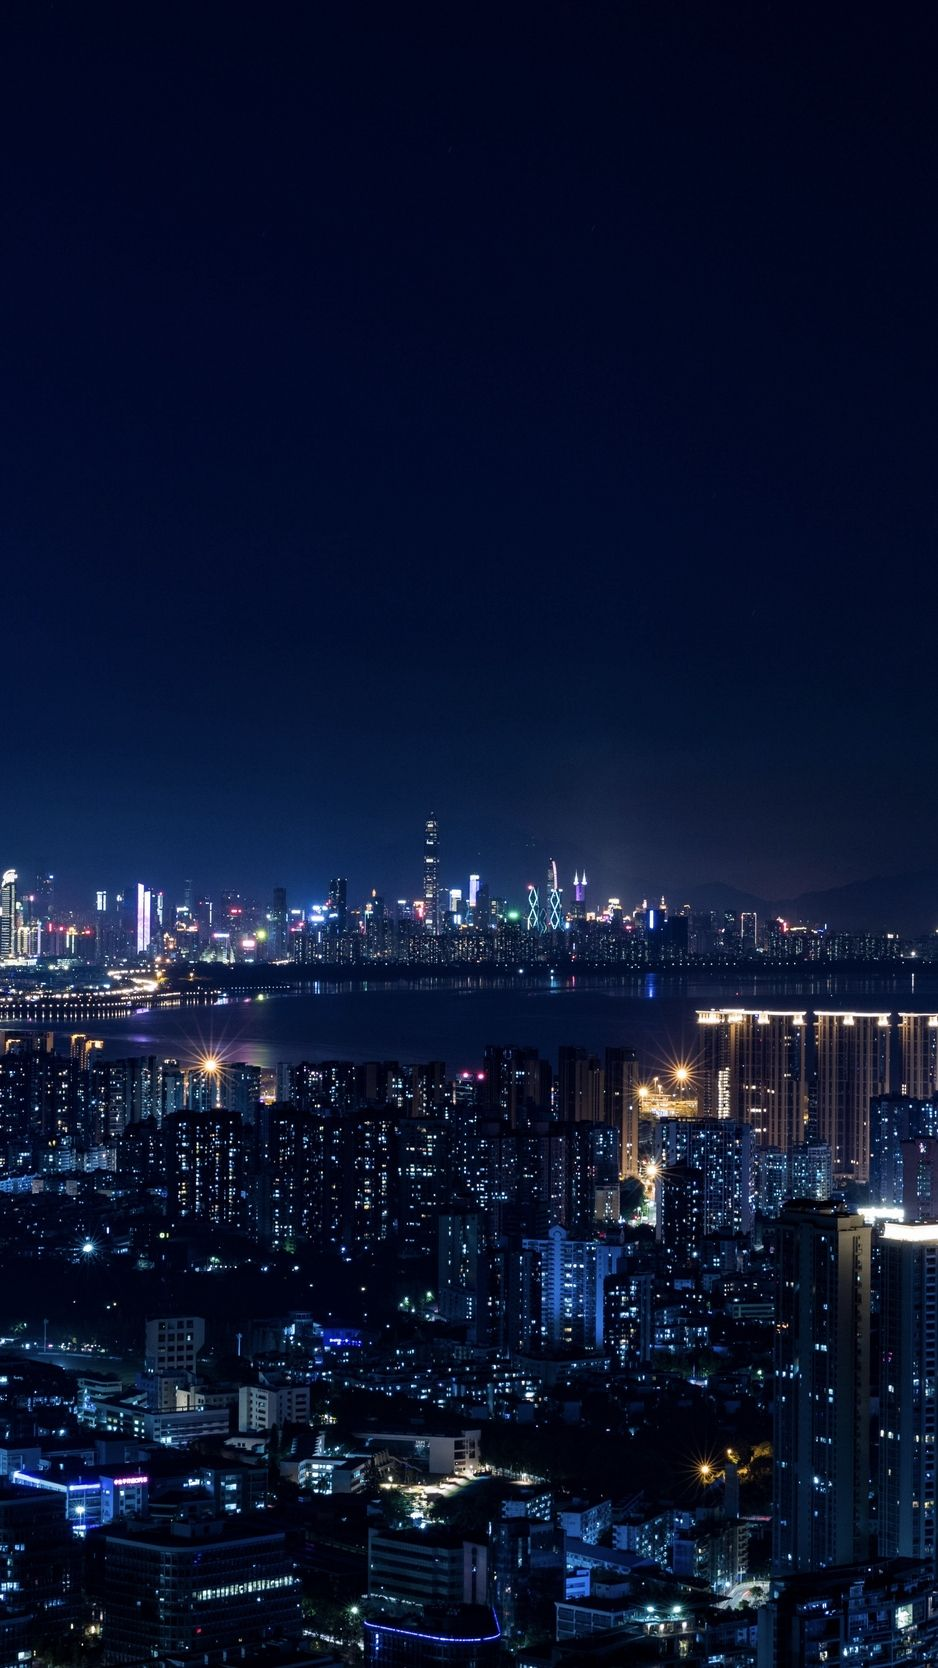 Night City Wallpapers On Wallpaperdog